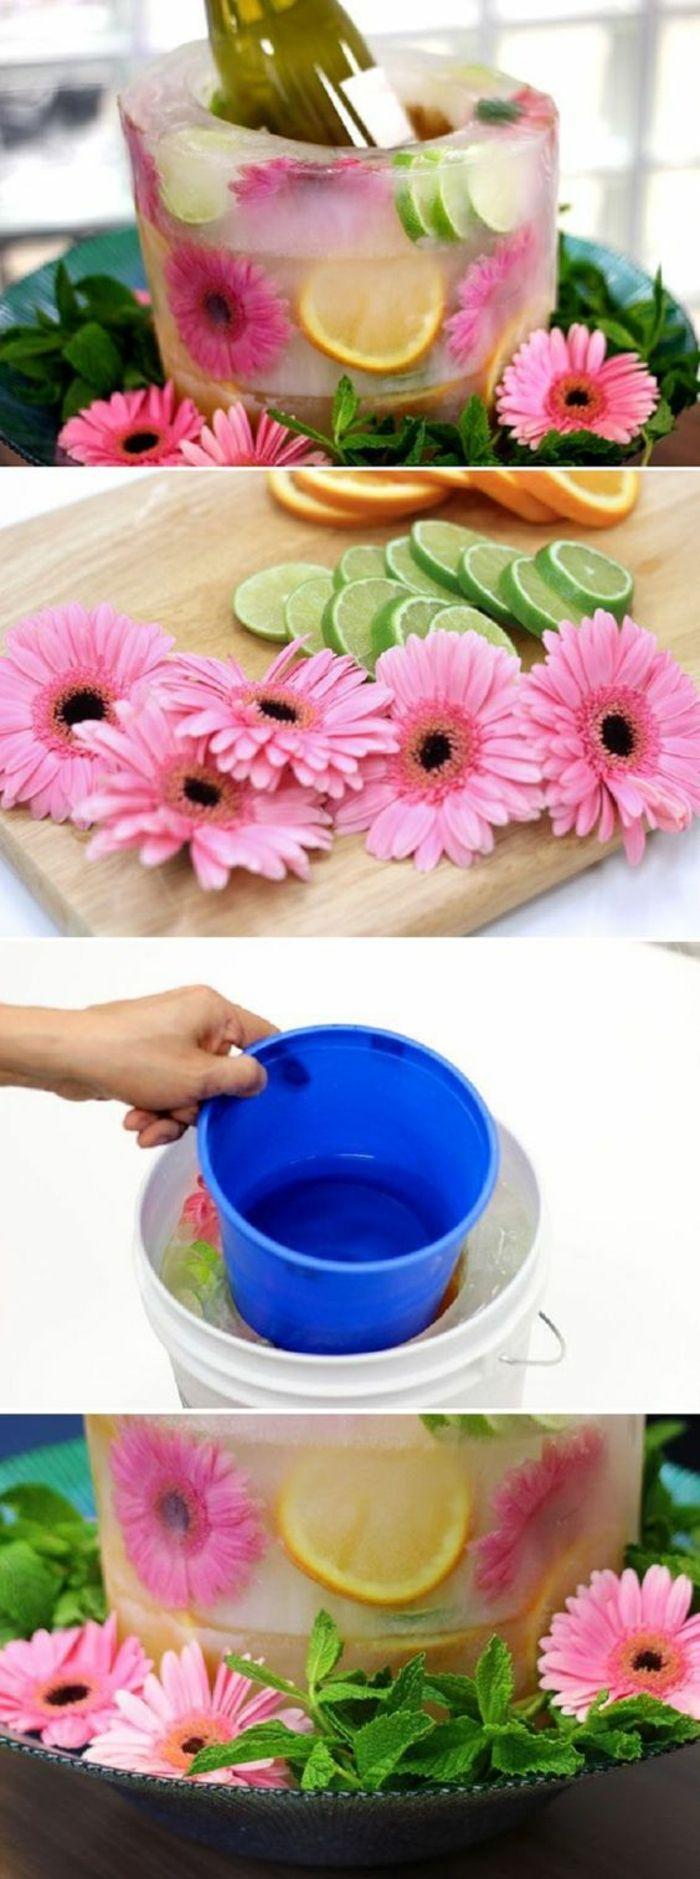 bastelideen fr C3 BChling rosa blumen eimer wasser limette limettenschale zitronenschale